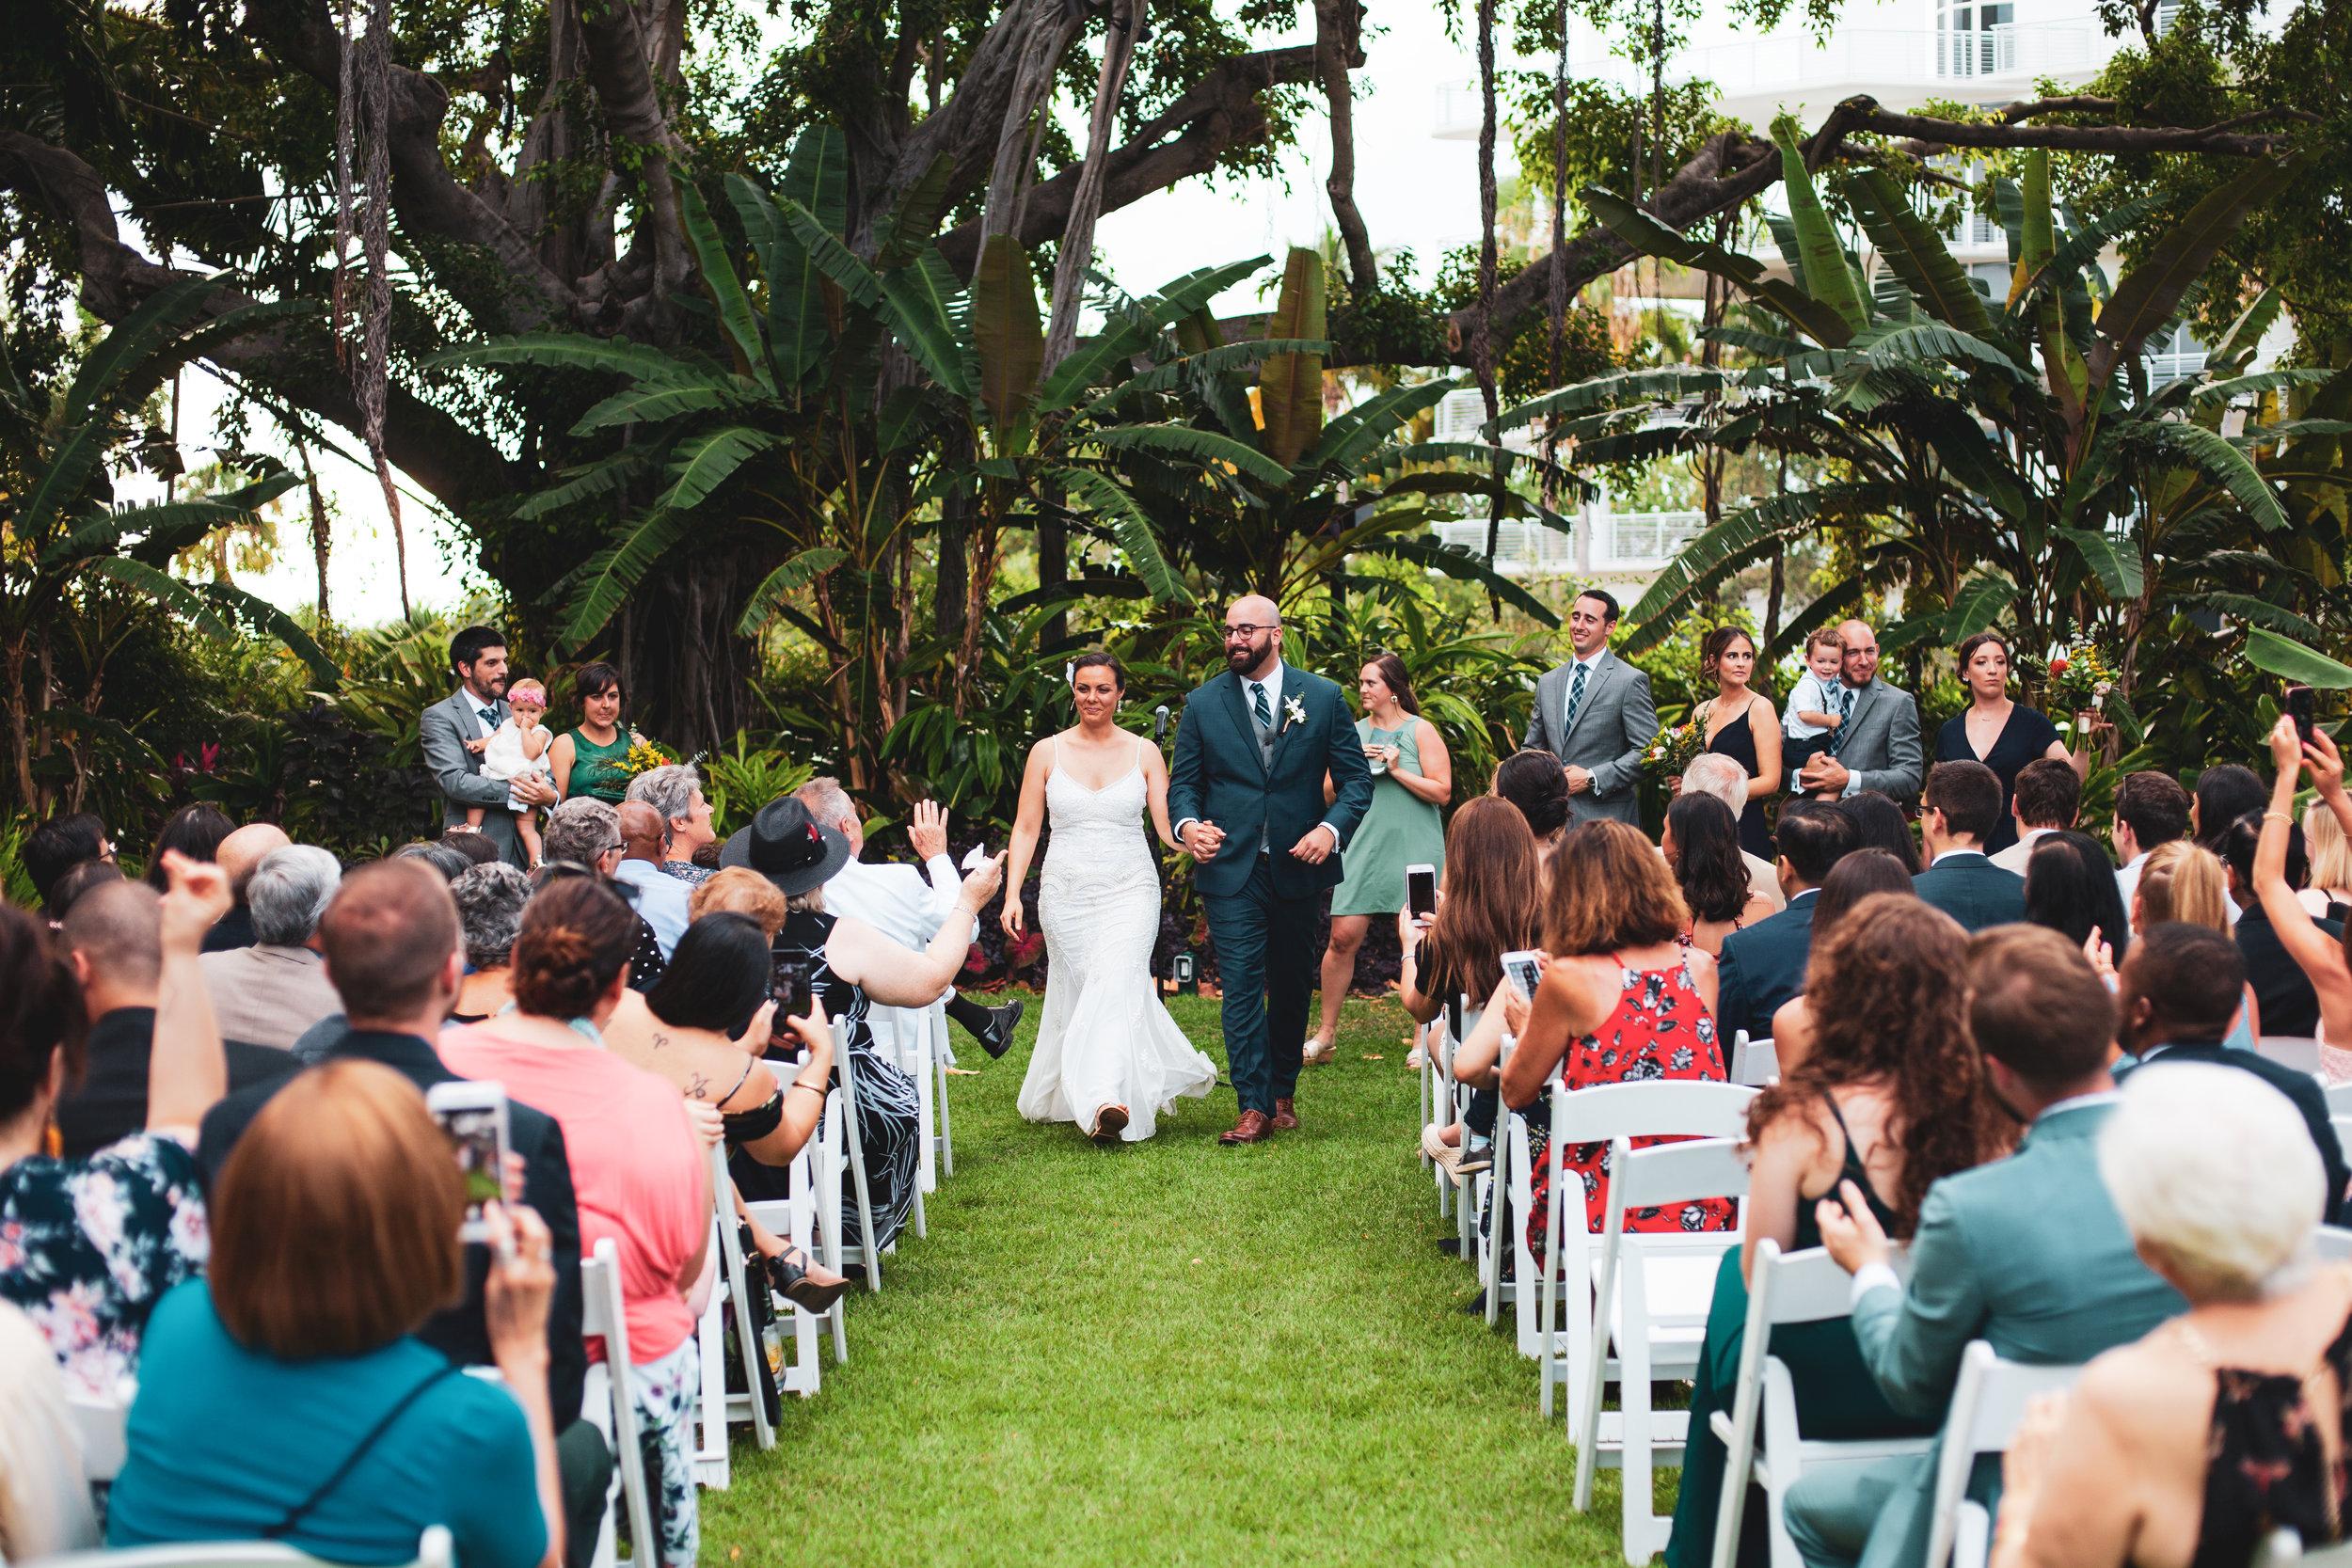 miami beach botanical garden florida wedding © kelilina photography 20190601123908-5.jpg